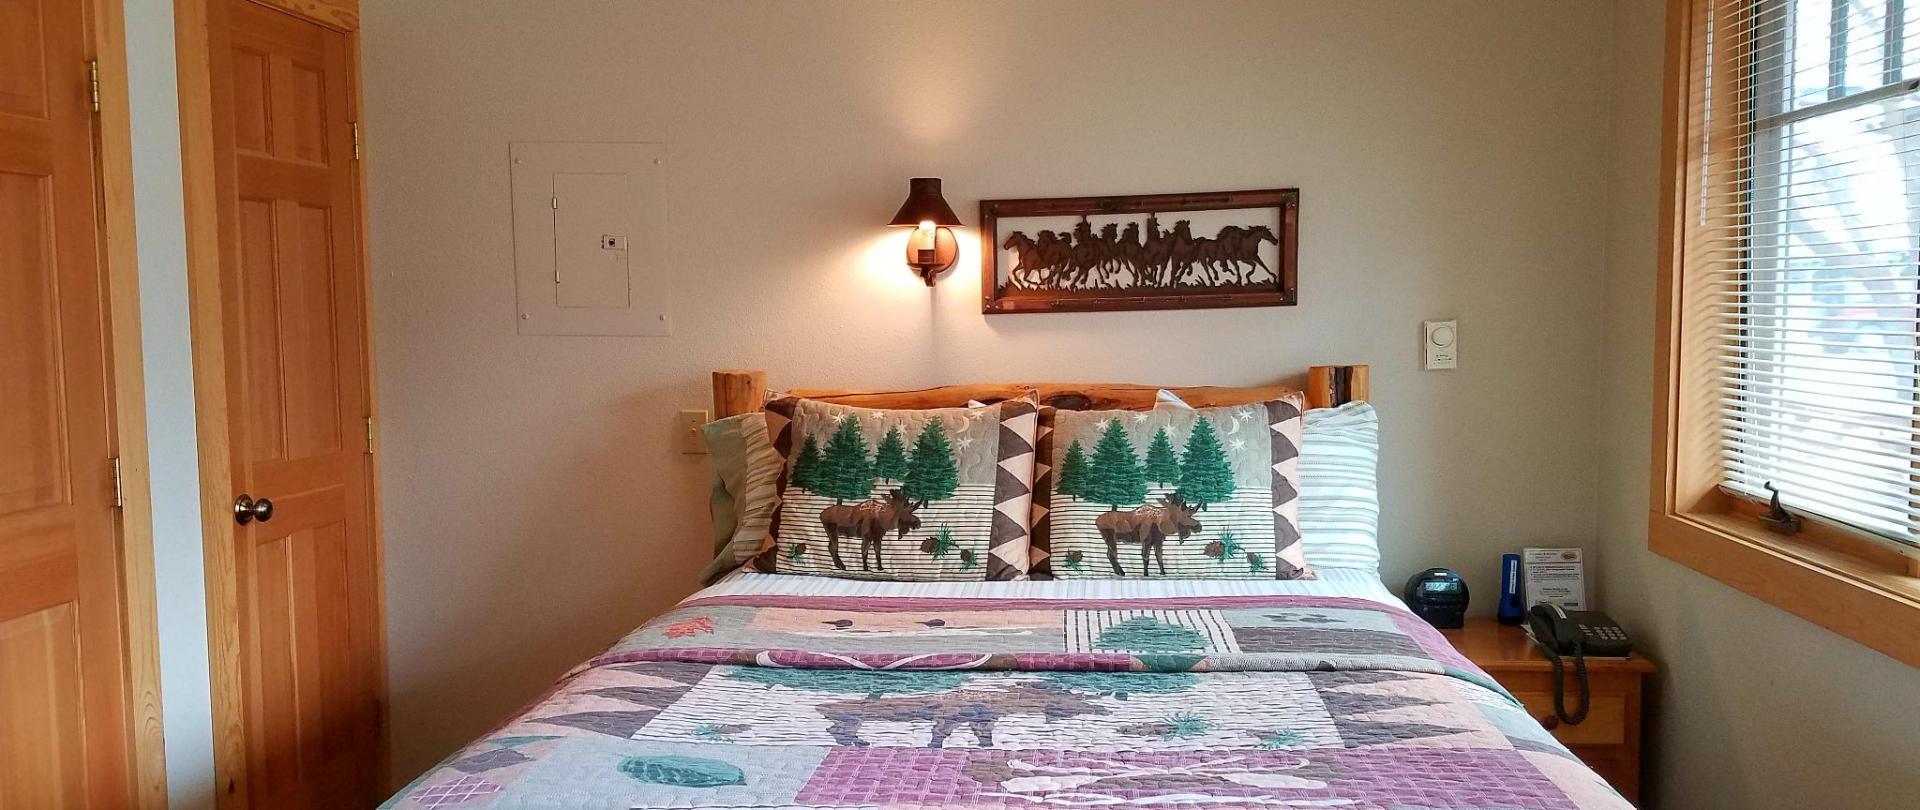 Cozy Bed.jpg